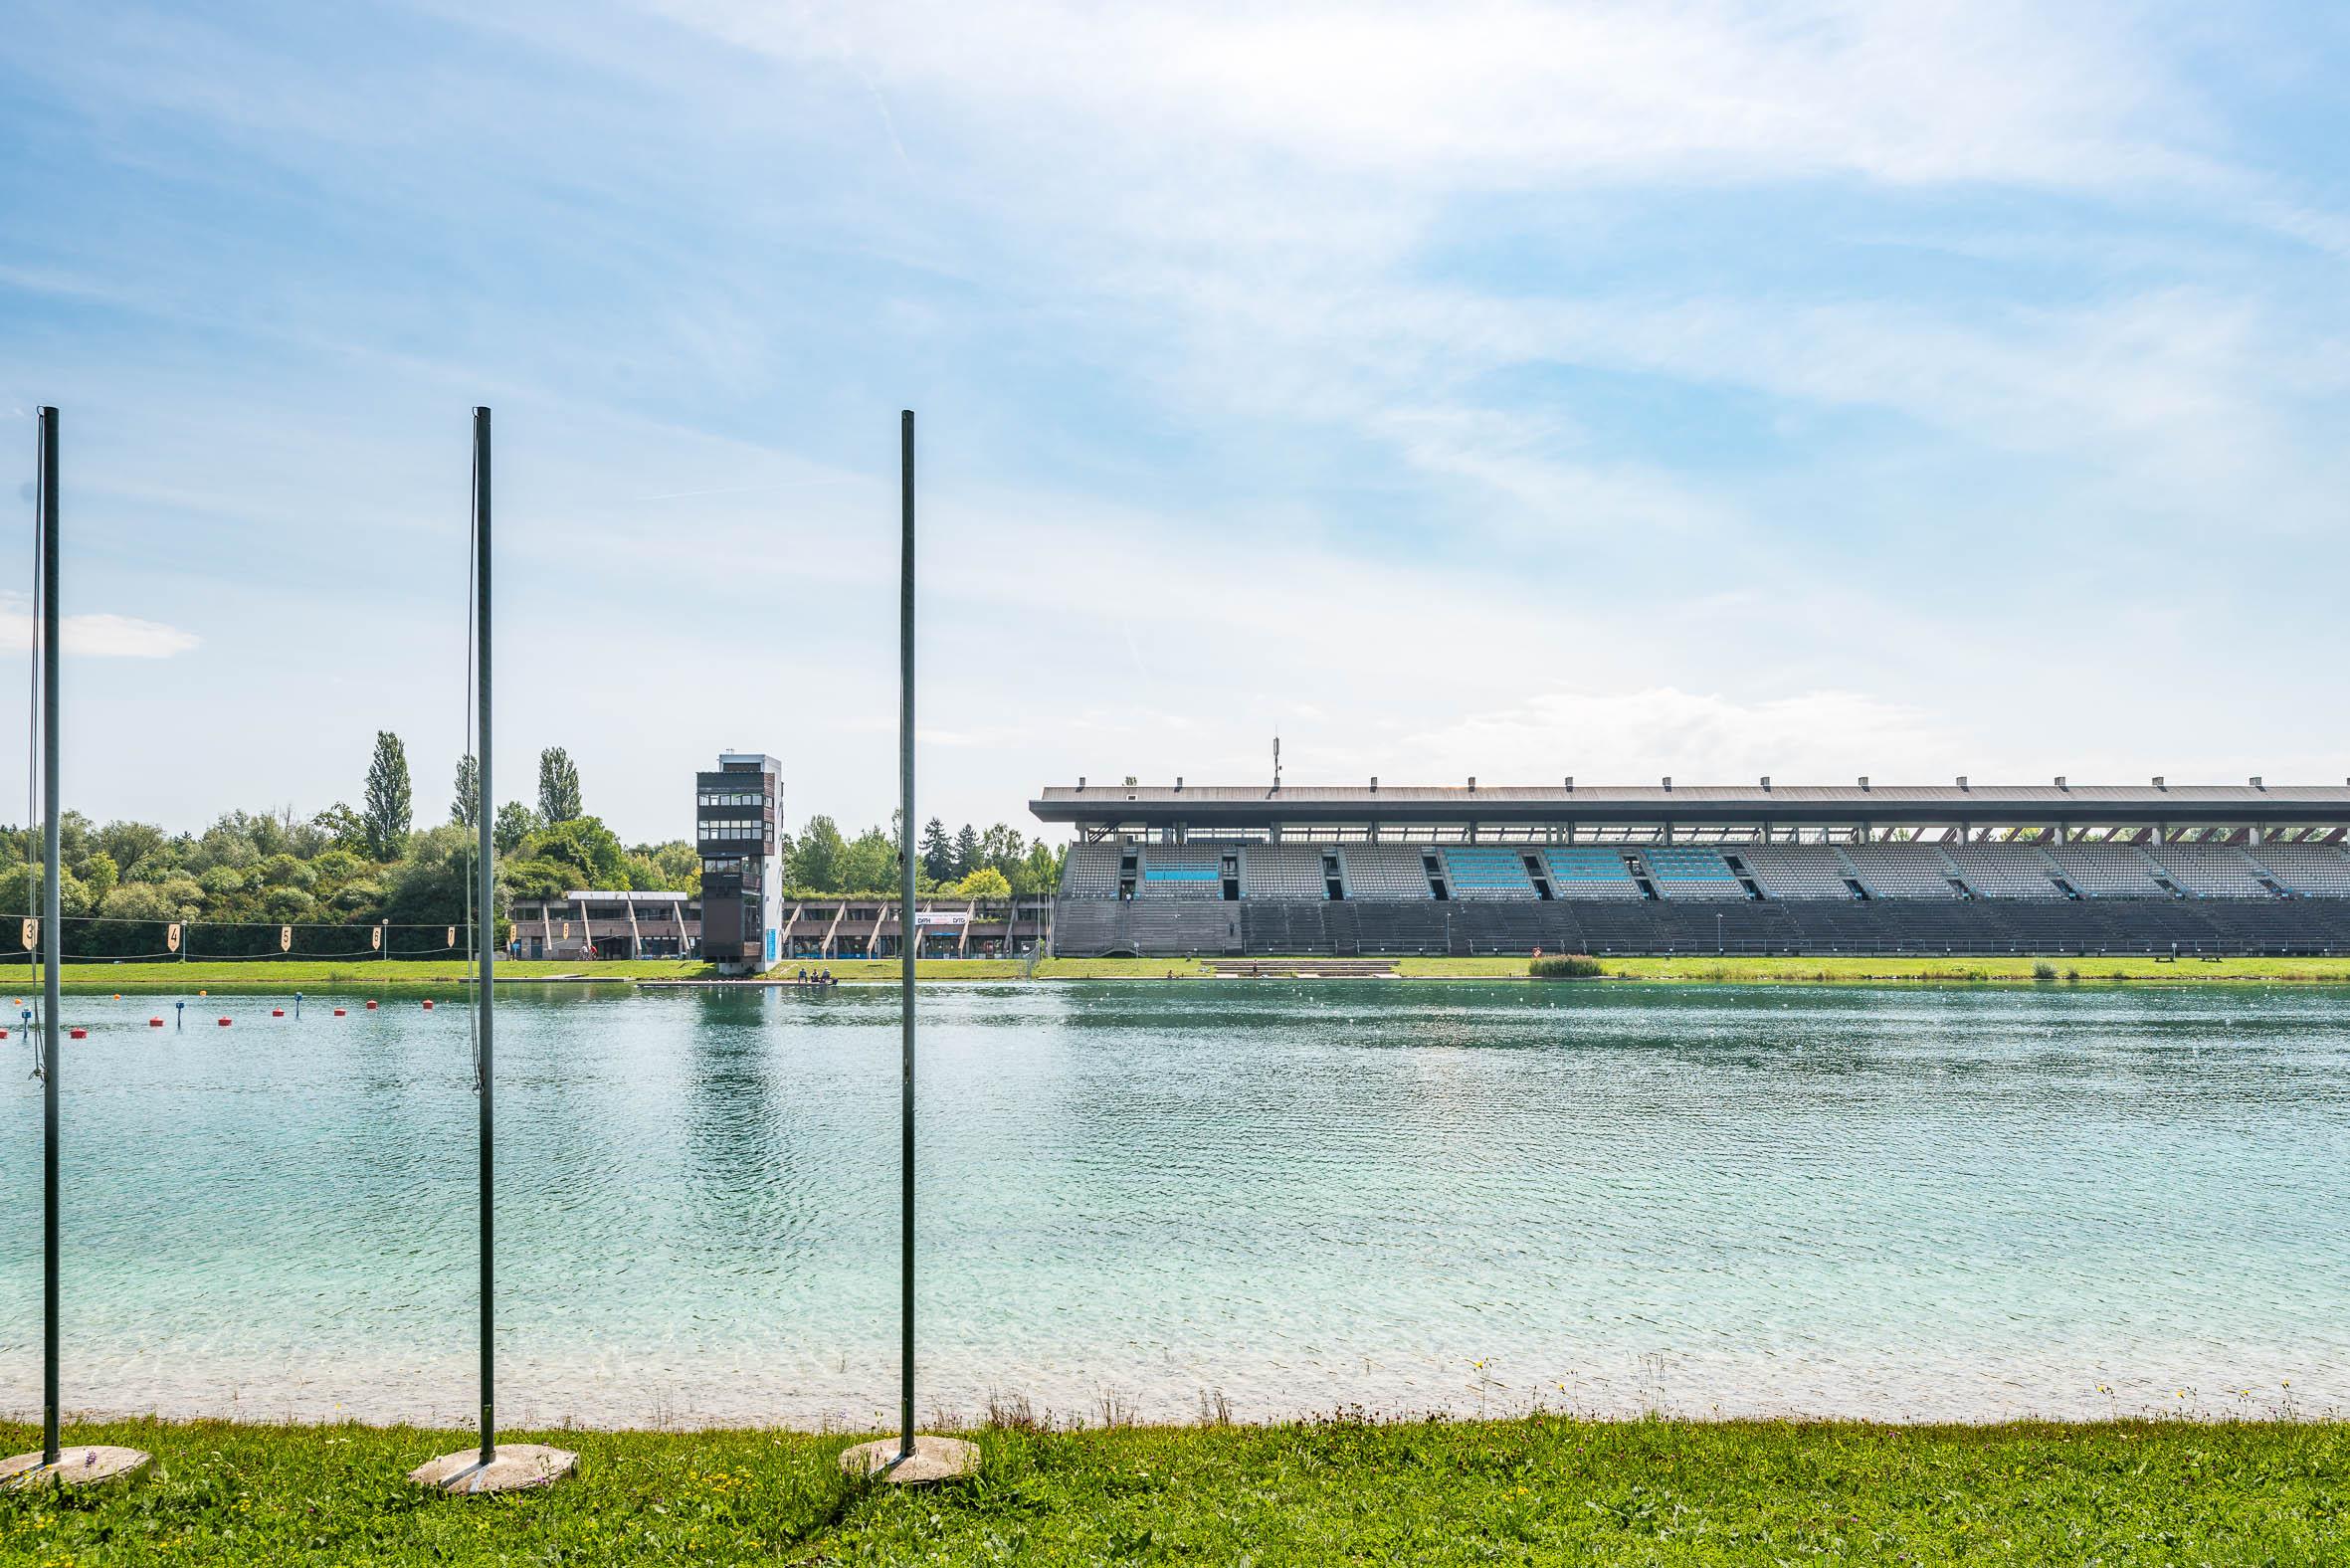 Architekturfotografie Olympia Regattastrecke Oberschleißheim